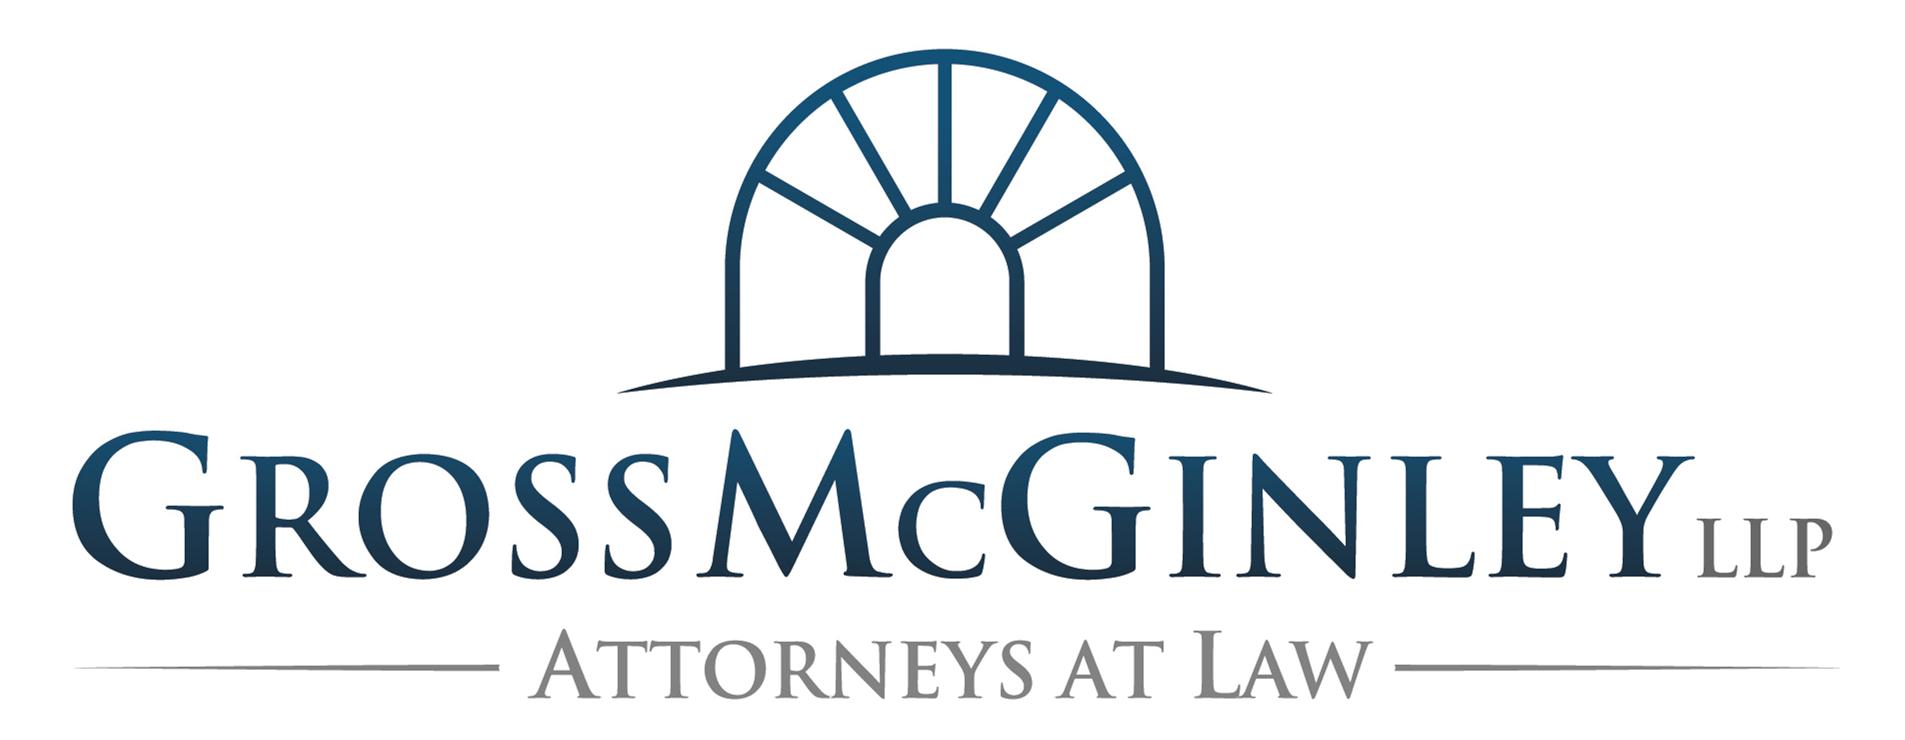 Gross McGinley, LLP law firm logo